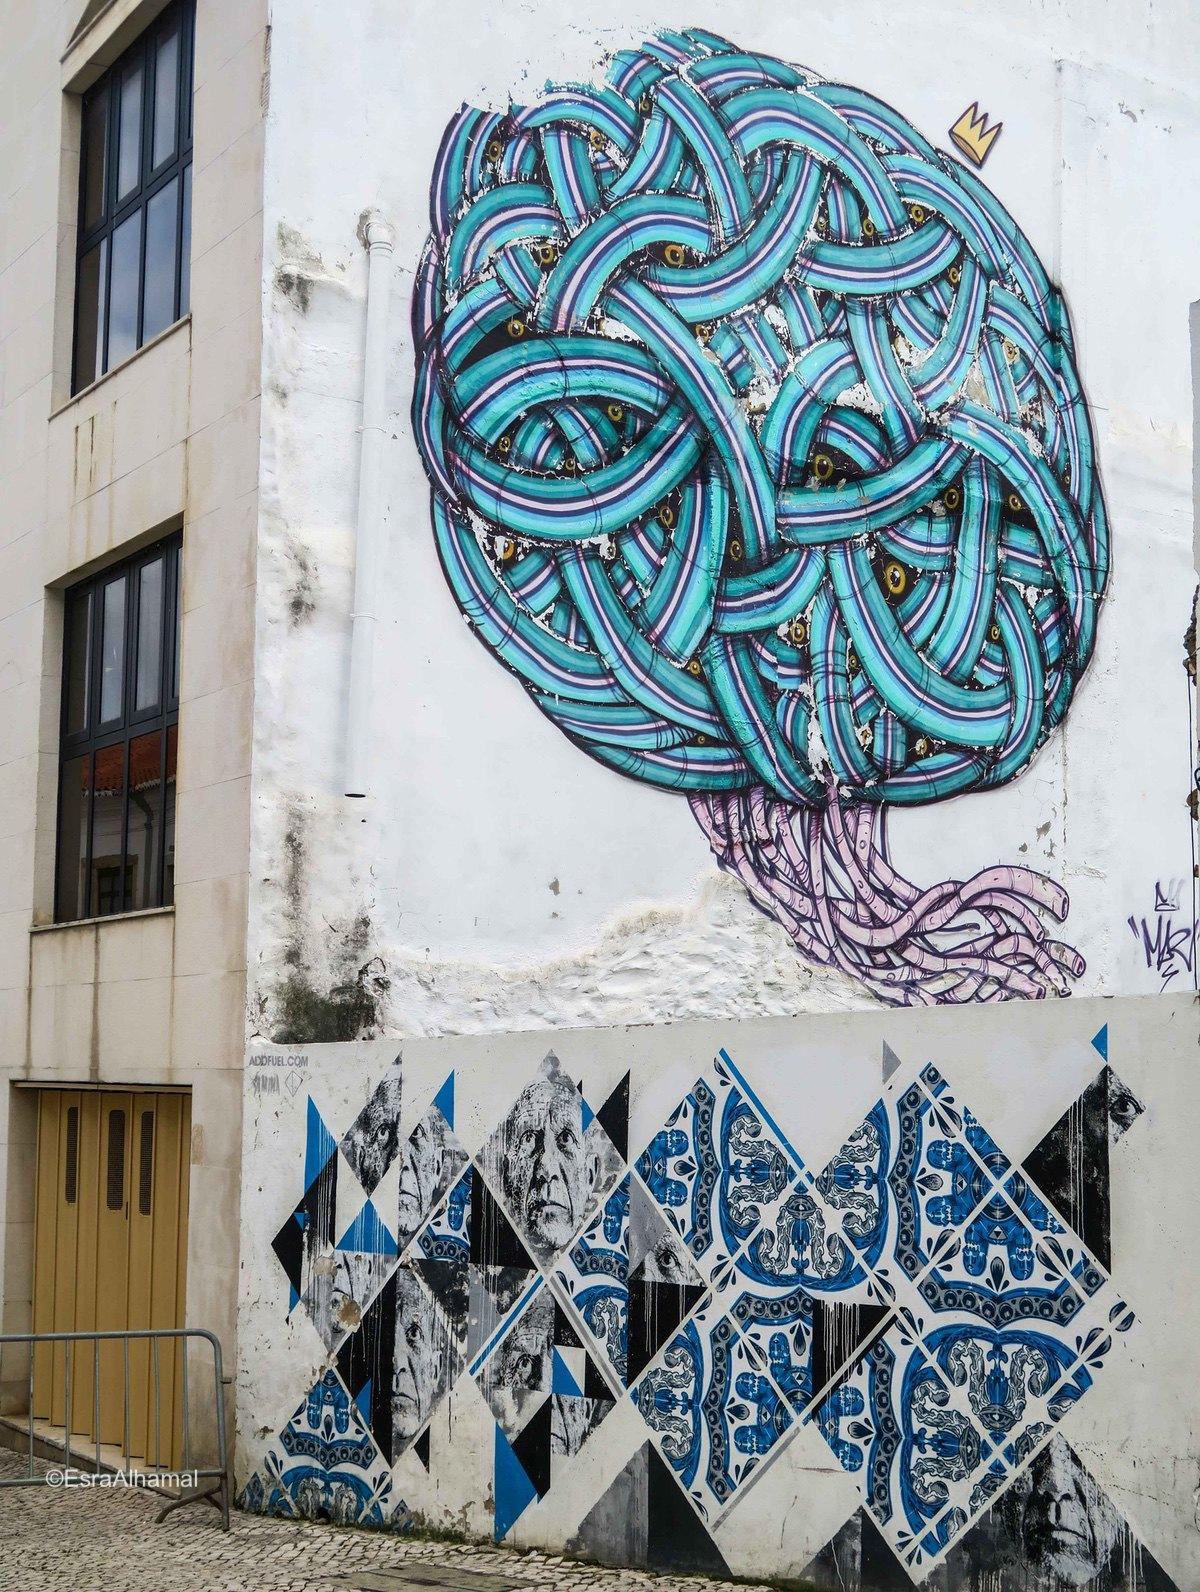 Graffiti in Lagos, Portugal